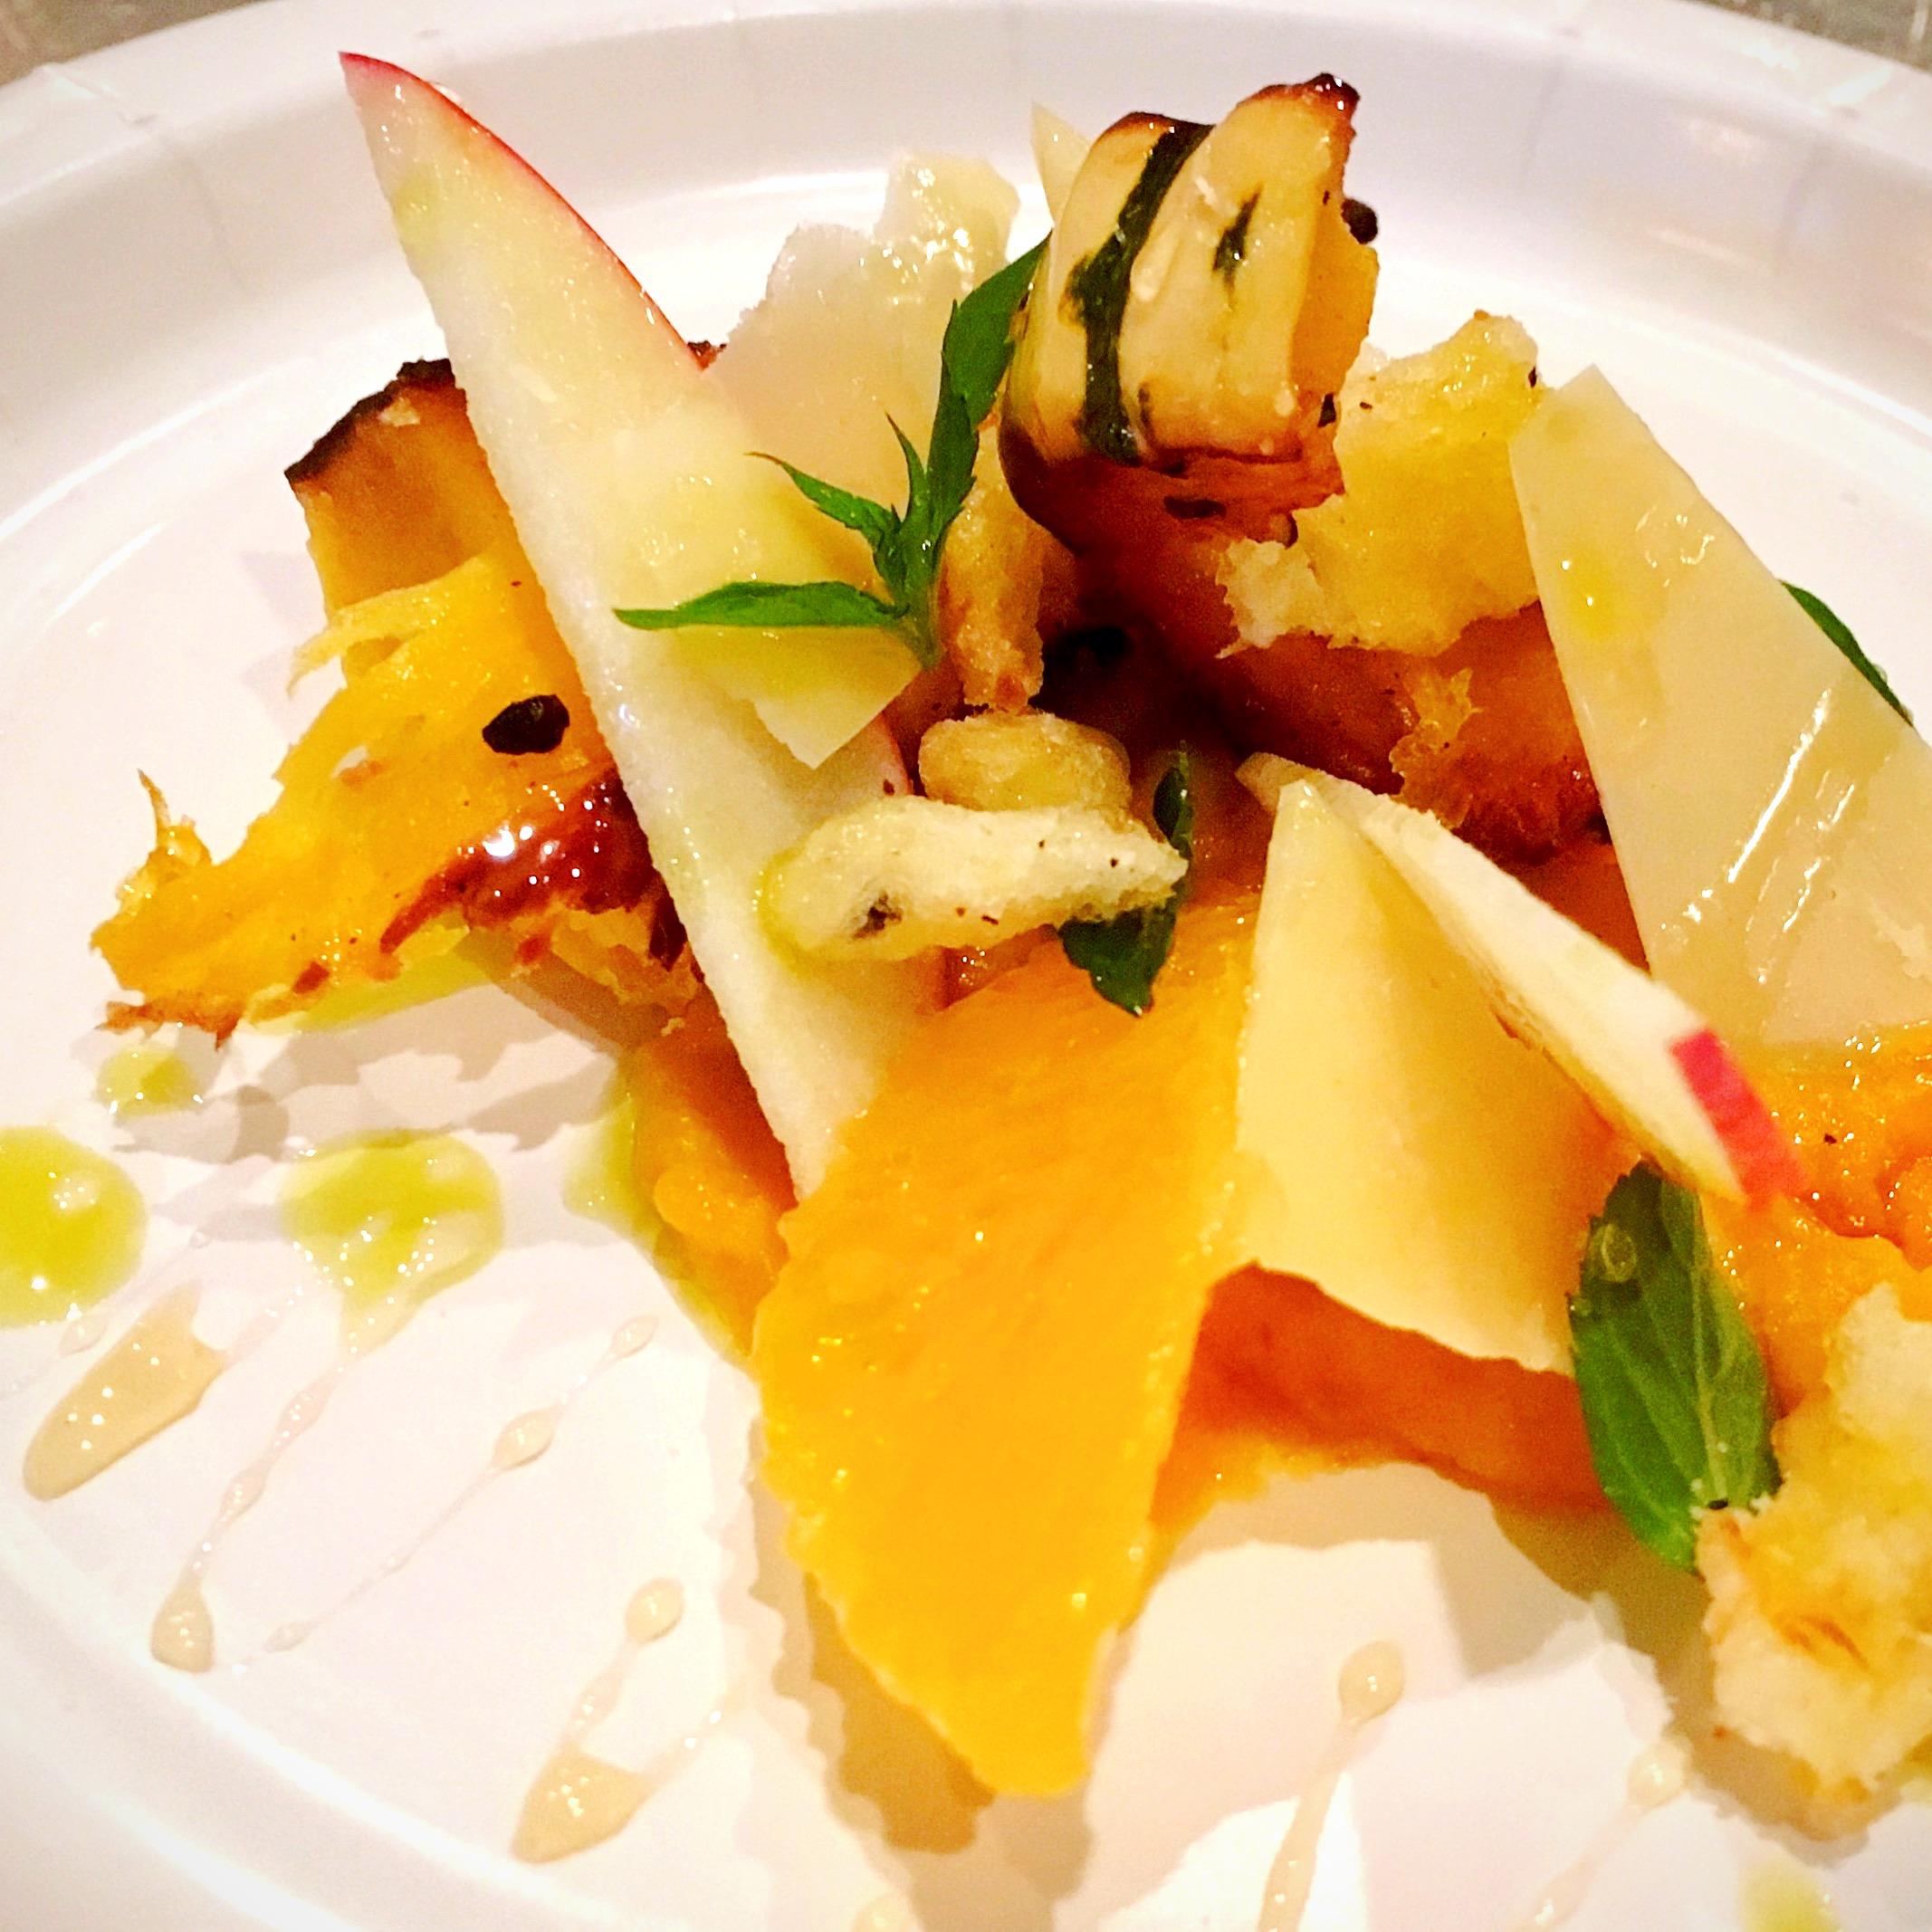 Roasted Squash and Citrus Salad